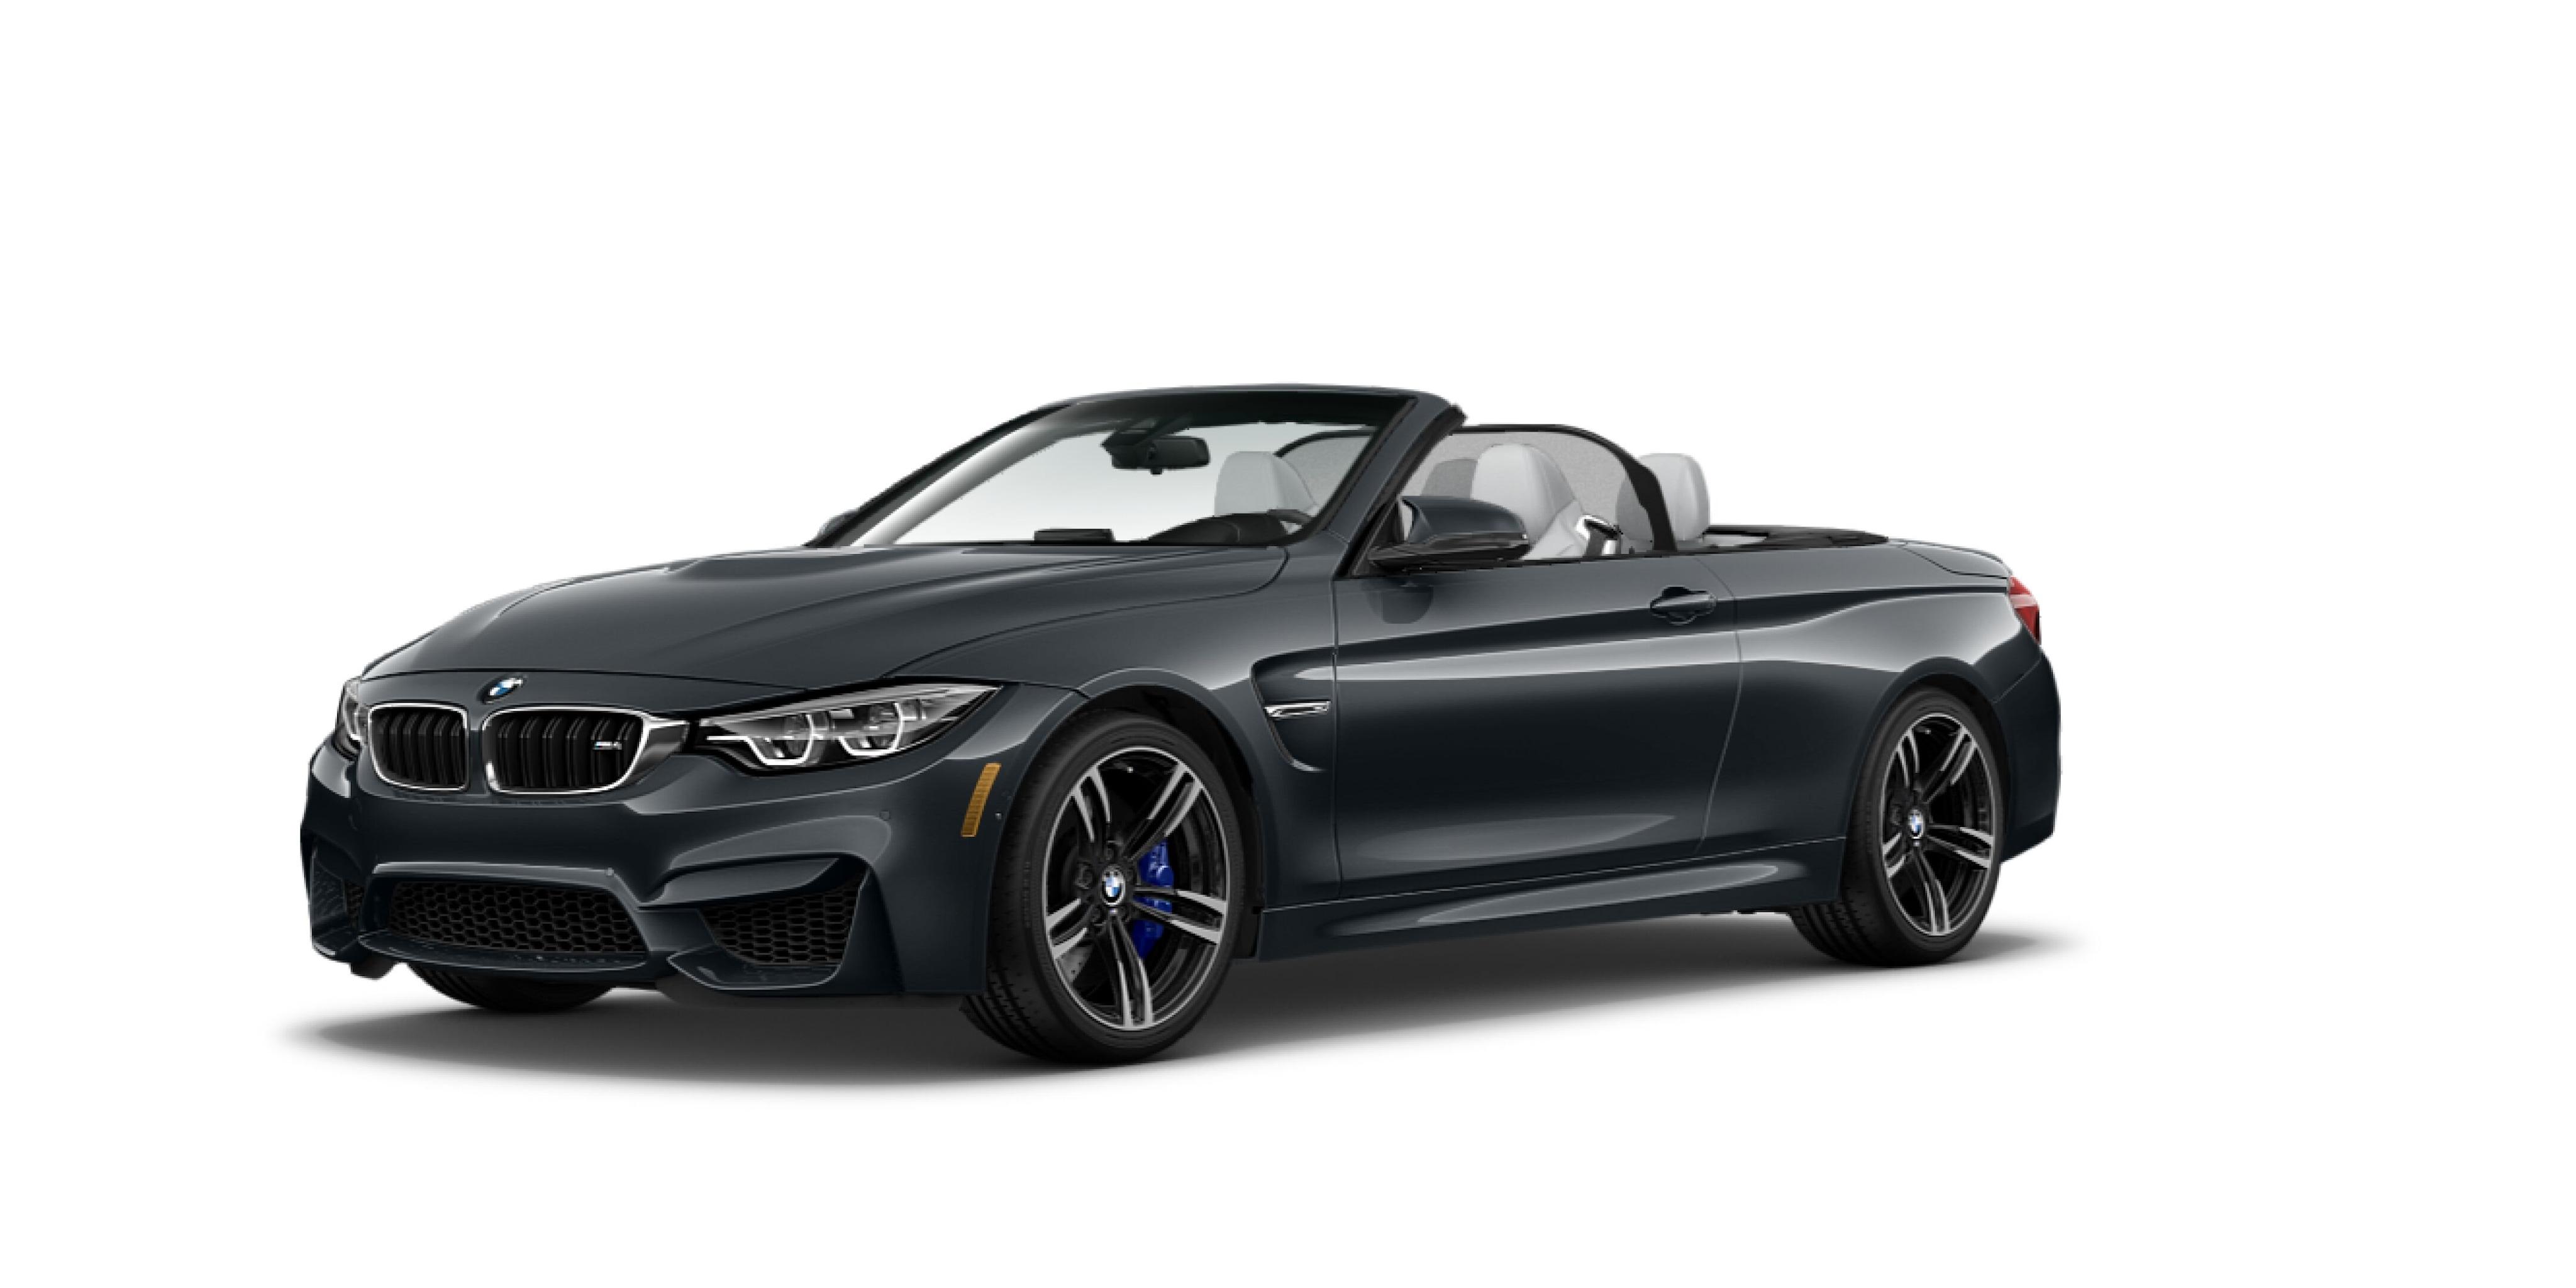 2020 BMW M4 2DR CONV Convertible